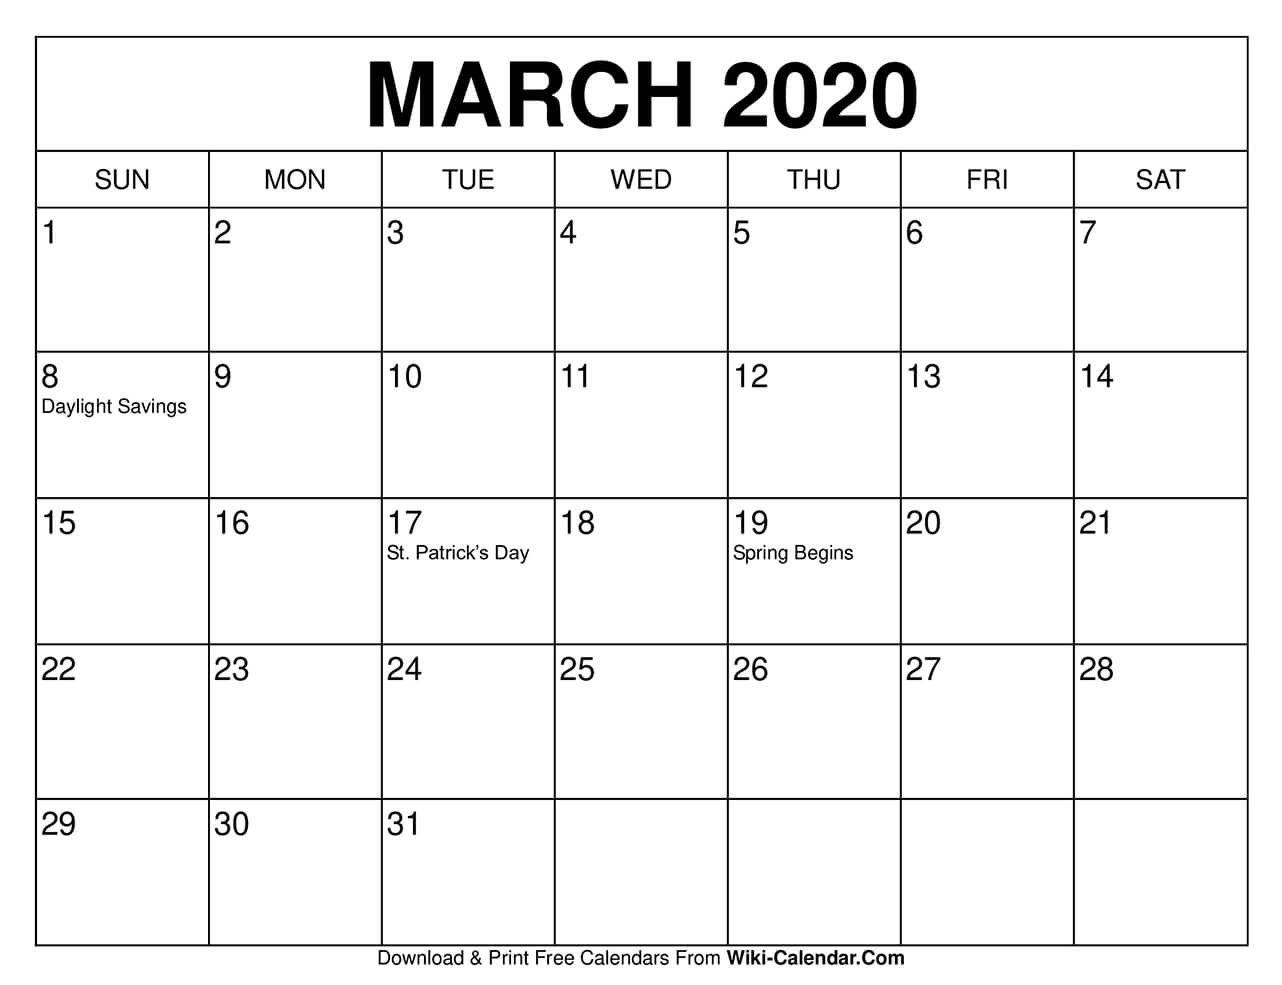 Free Printable March 2020 Calendars 8X11 Printable Monthly Calendar